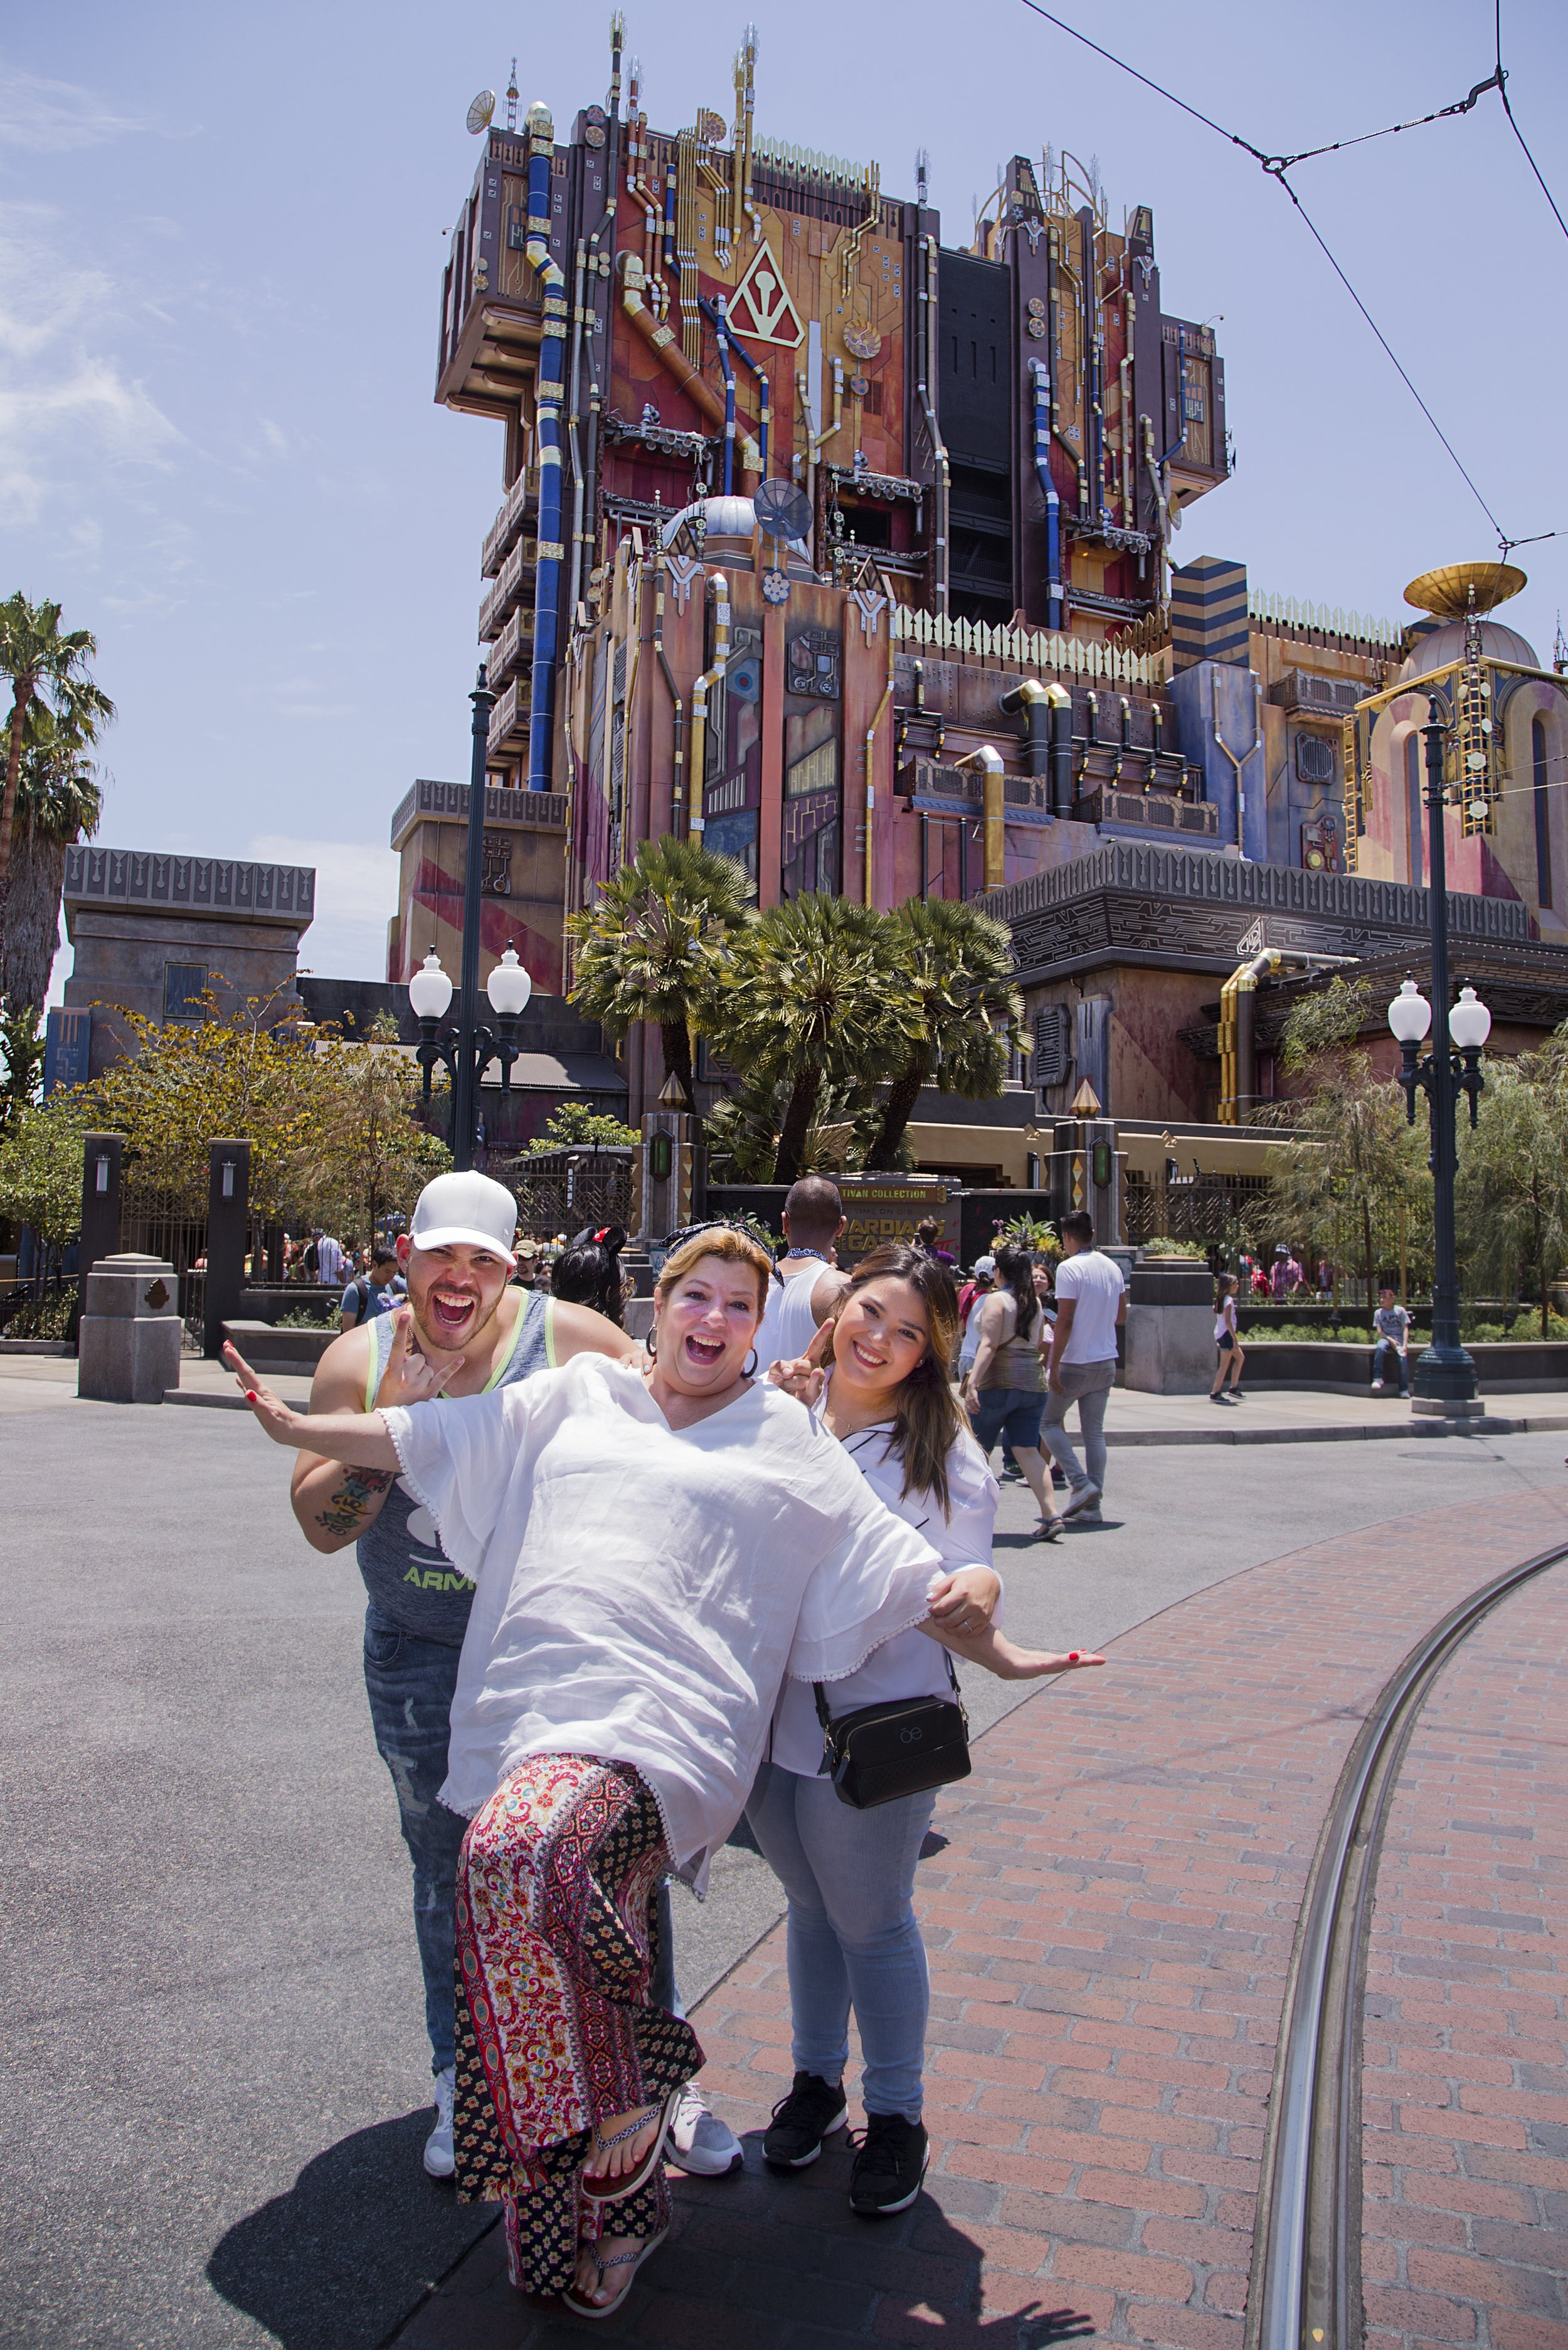 (July 5, 2017) Margarita la Diosa de la Cumbia enjoys Guardians of the Galaxy - Mission: Breakout! with her children at Disney California Adventure park in Anaheim, Calif., on Wednesday . (Joshua Sudock/Disneyland Resort)